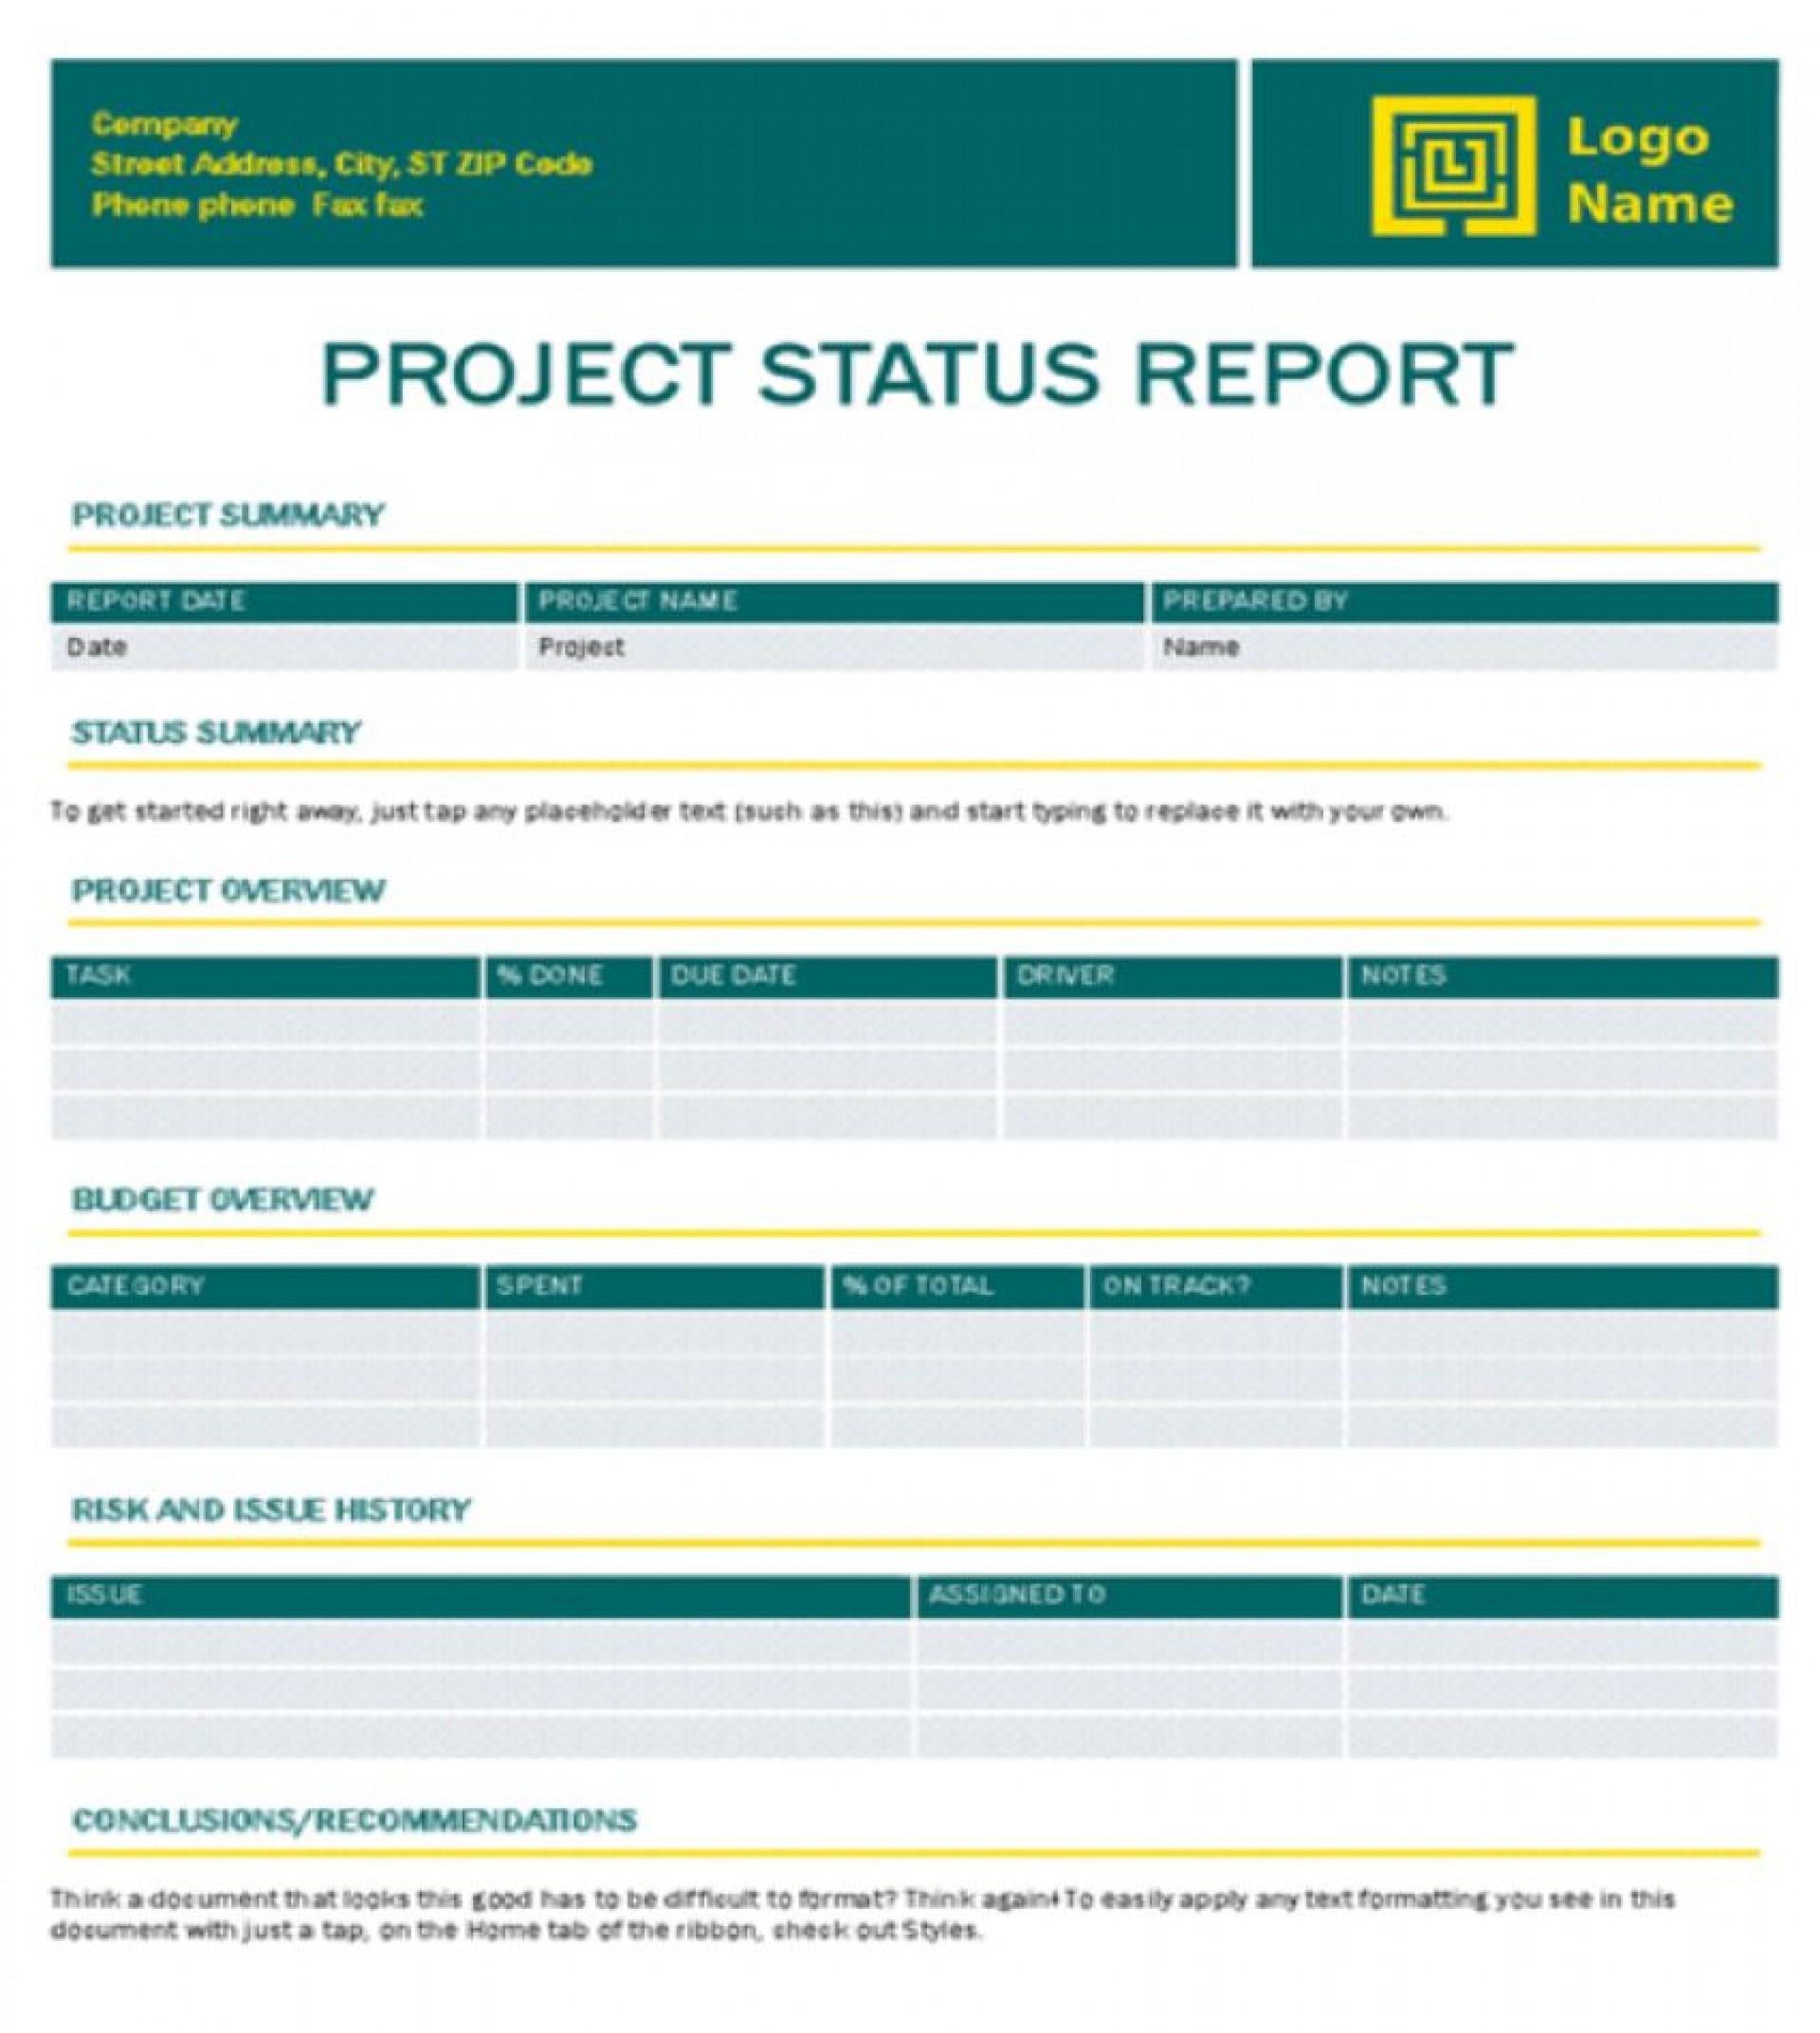 005 Amazing Project Management Progres Report Template Excel High Def  Statu1920